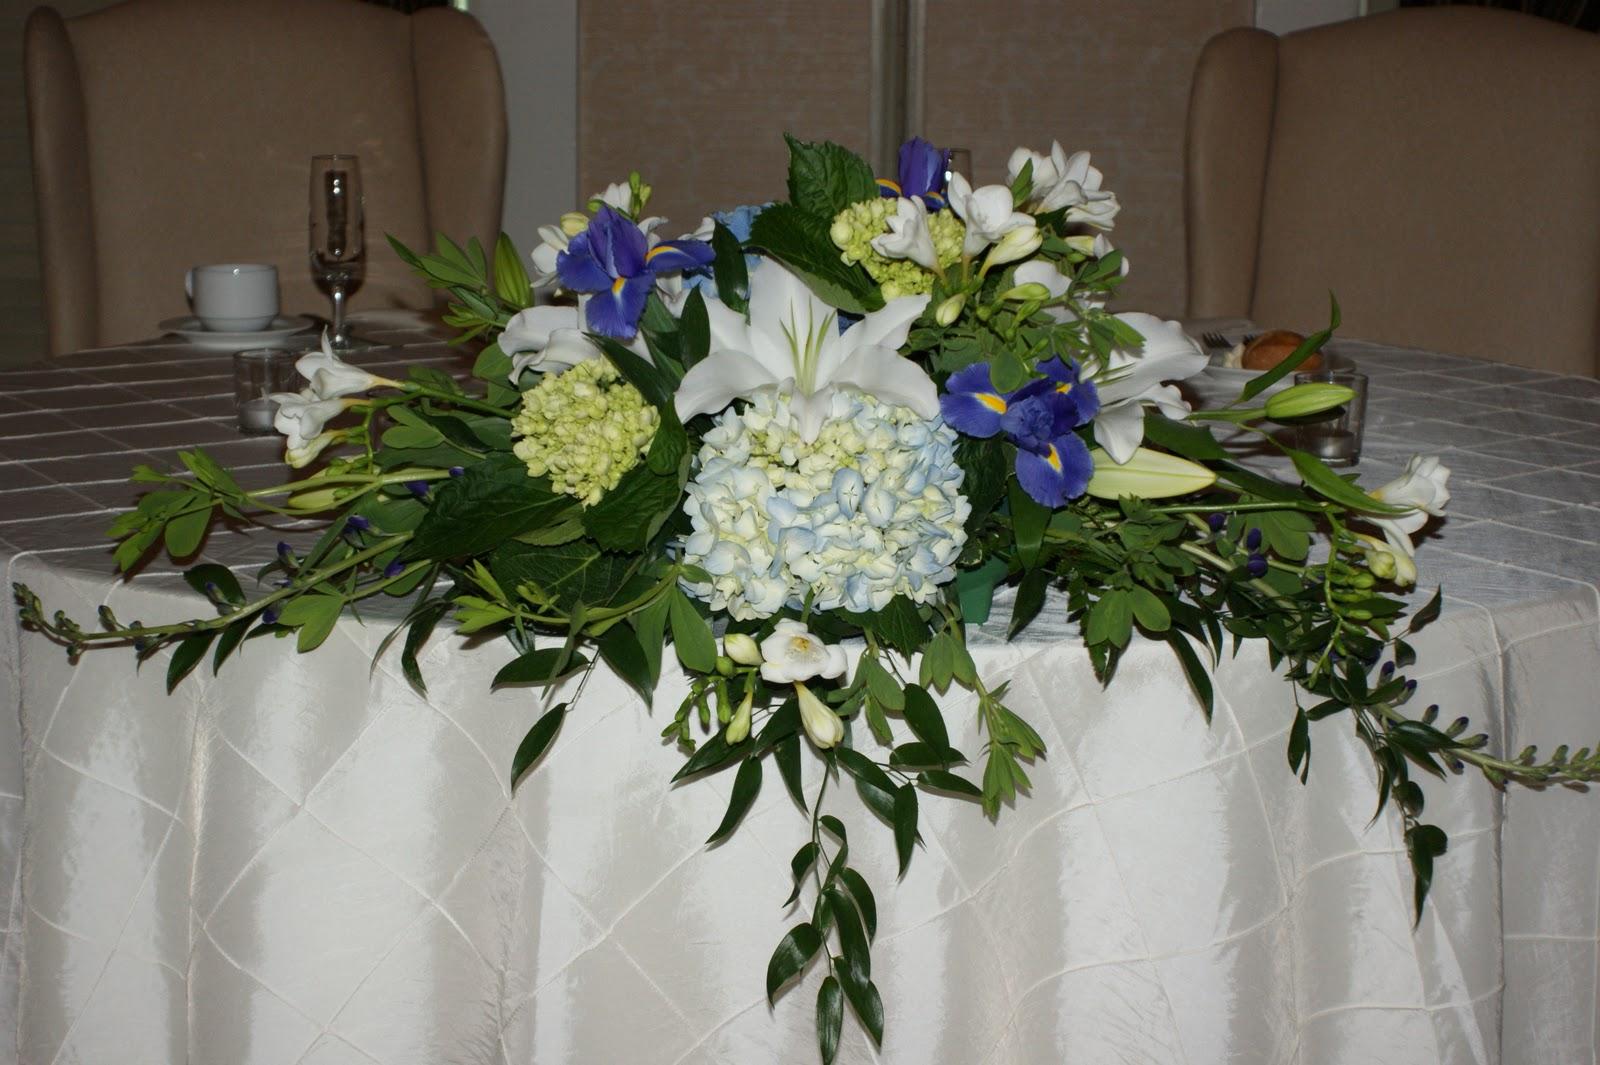 Felthousens Florist & Greenhouse: Wedding Head Table